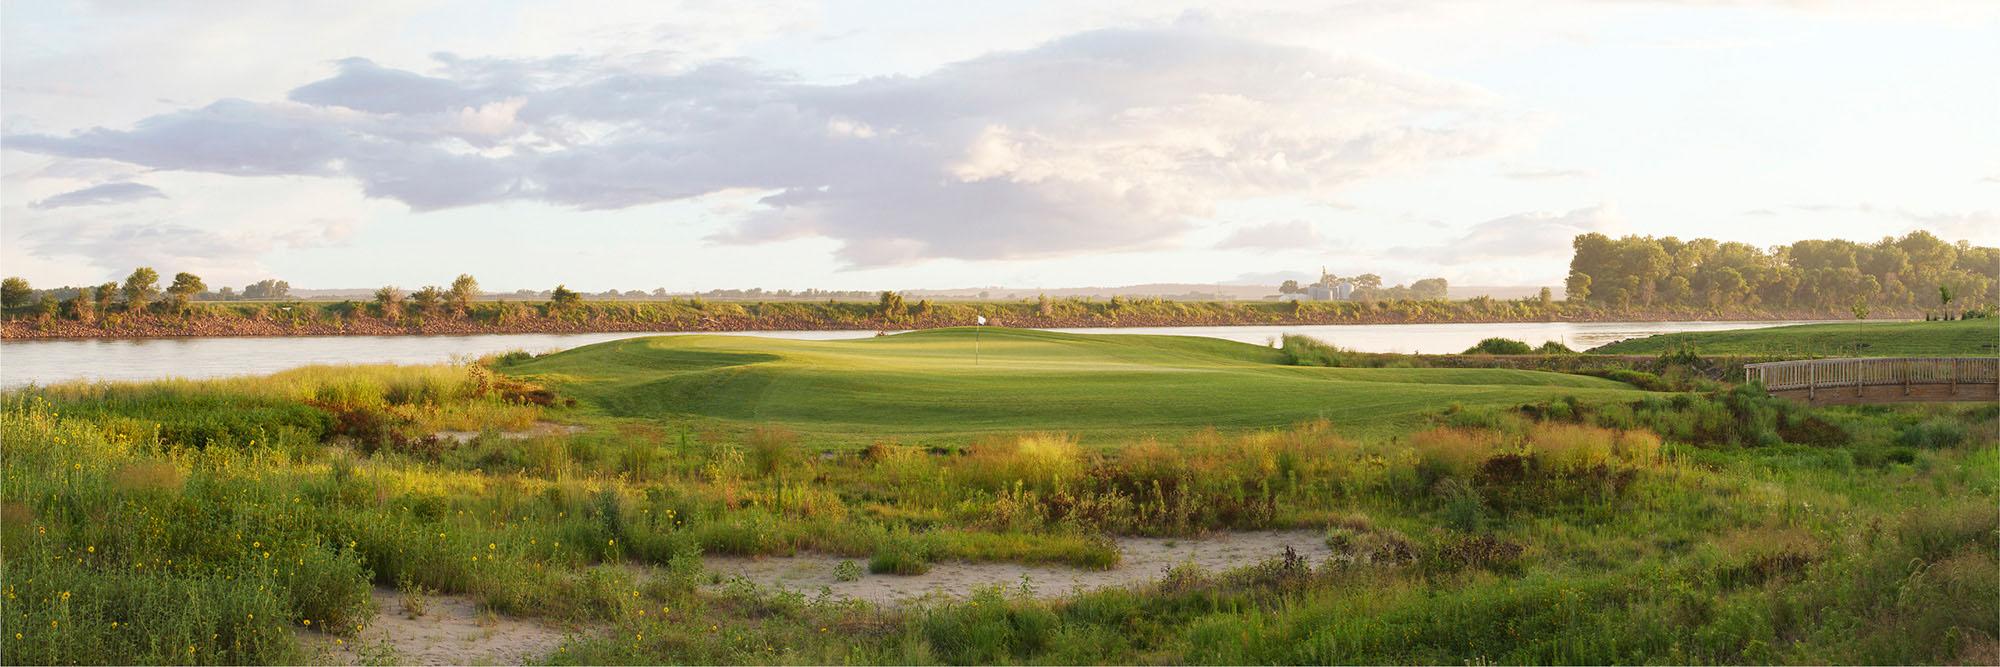 Golf Course Image - Dakota Dunes No. 8